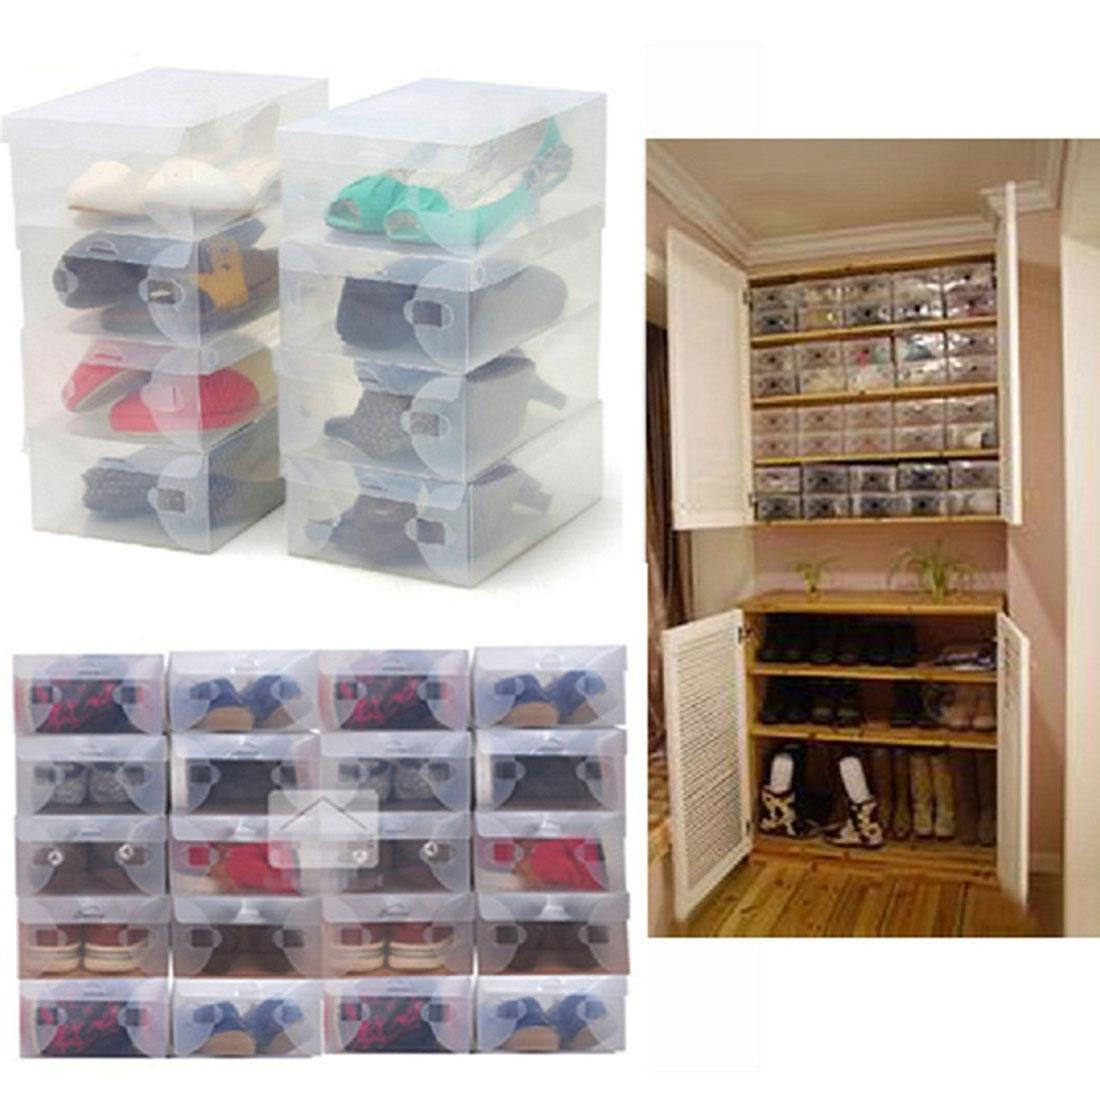 Hot Sale 10Pcs Transparent Clear Plastic Shoes Storage Boxes Foldable Shoes Case Holder(China (Mainland))